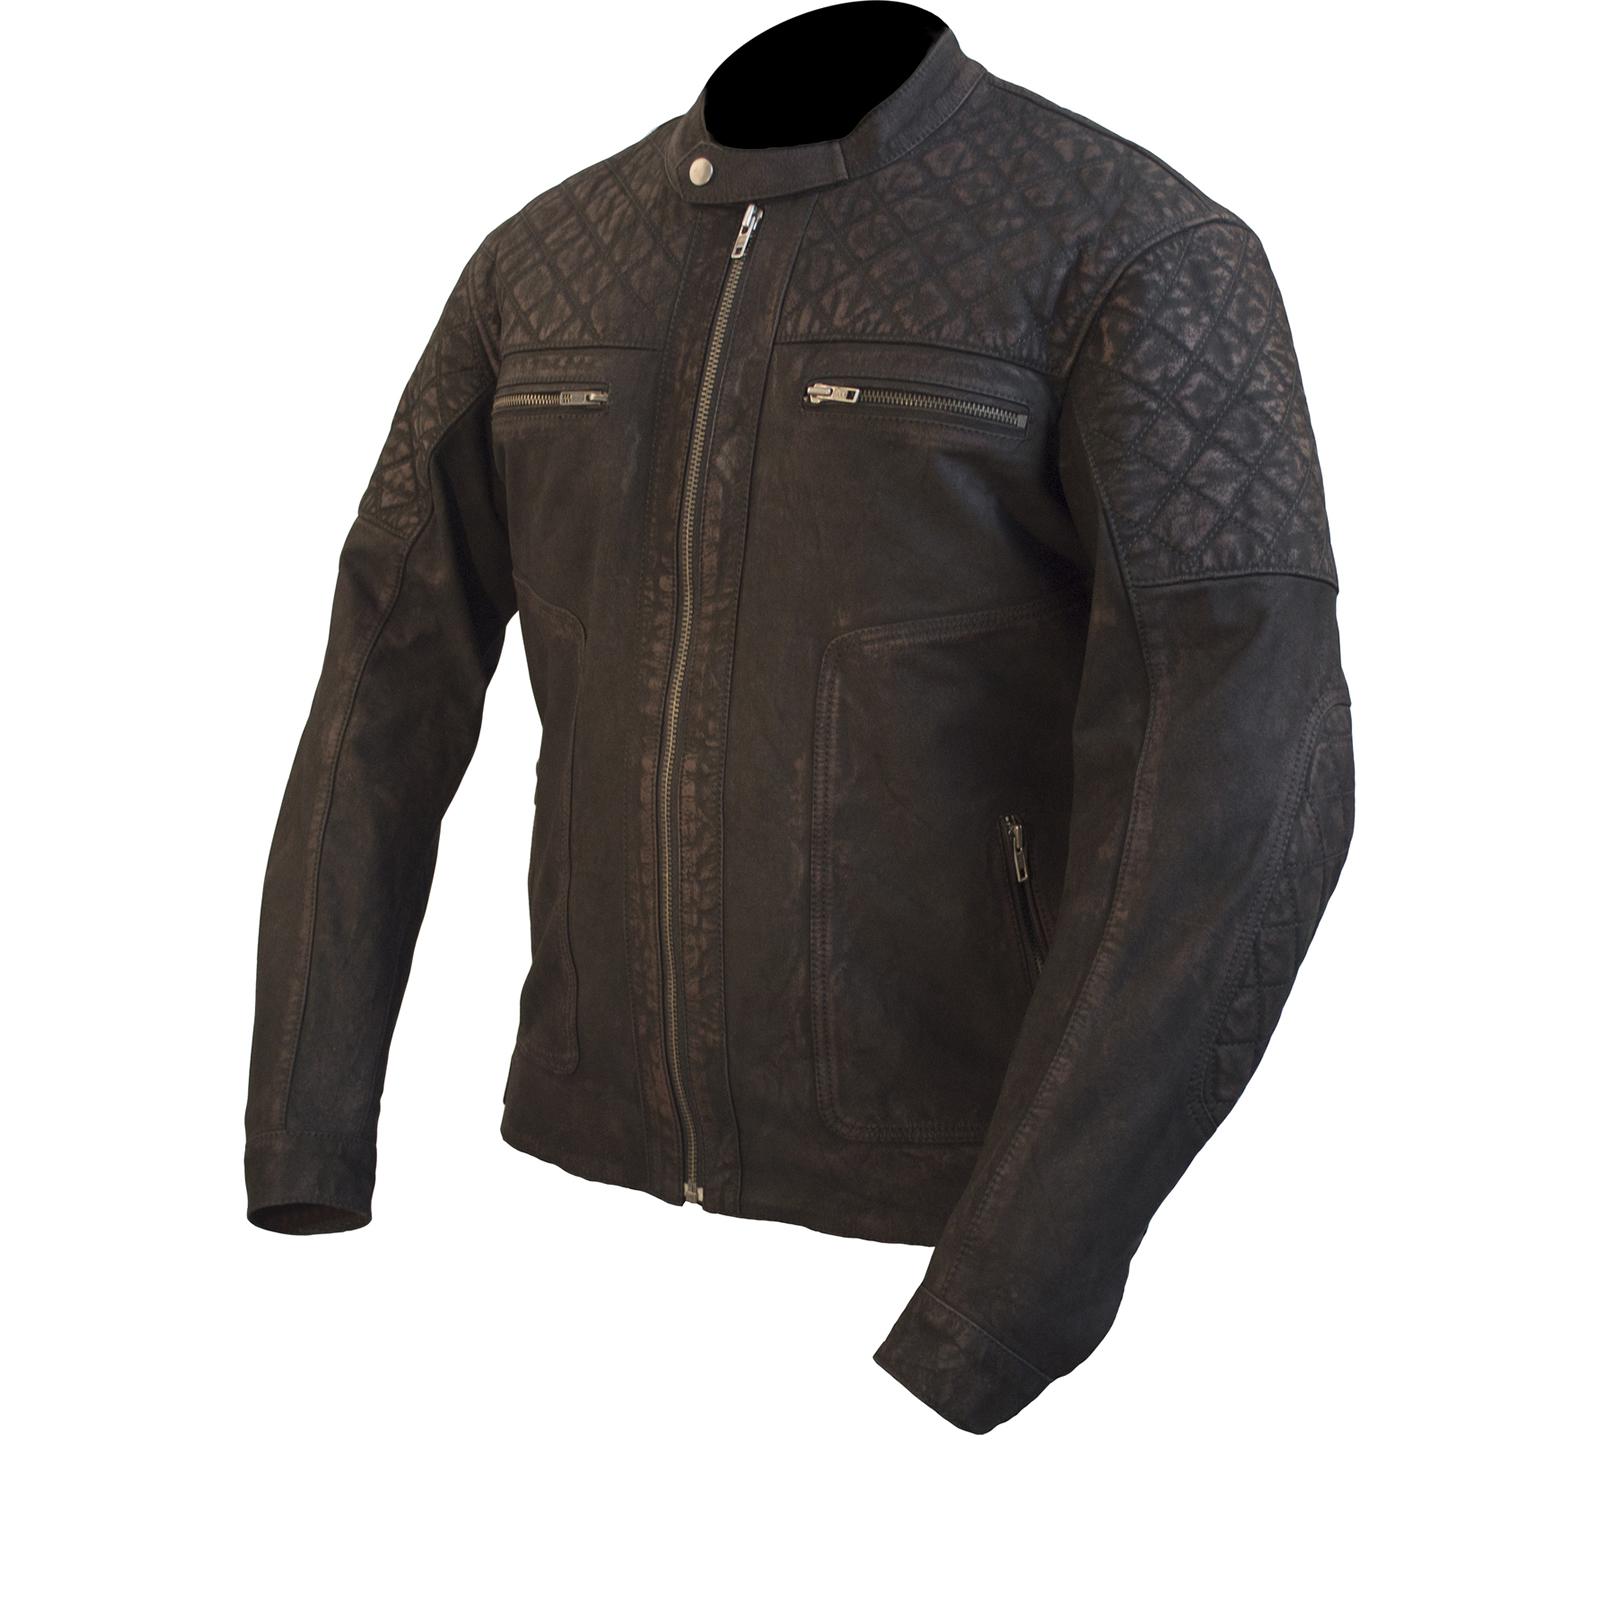 Armr Moto Retoro Classic Leather Motorcycle Jacket